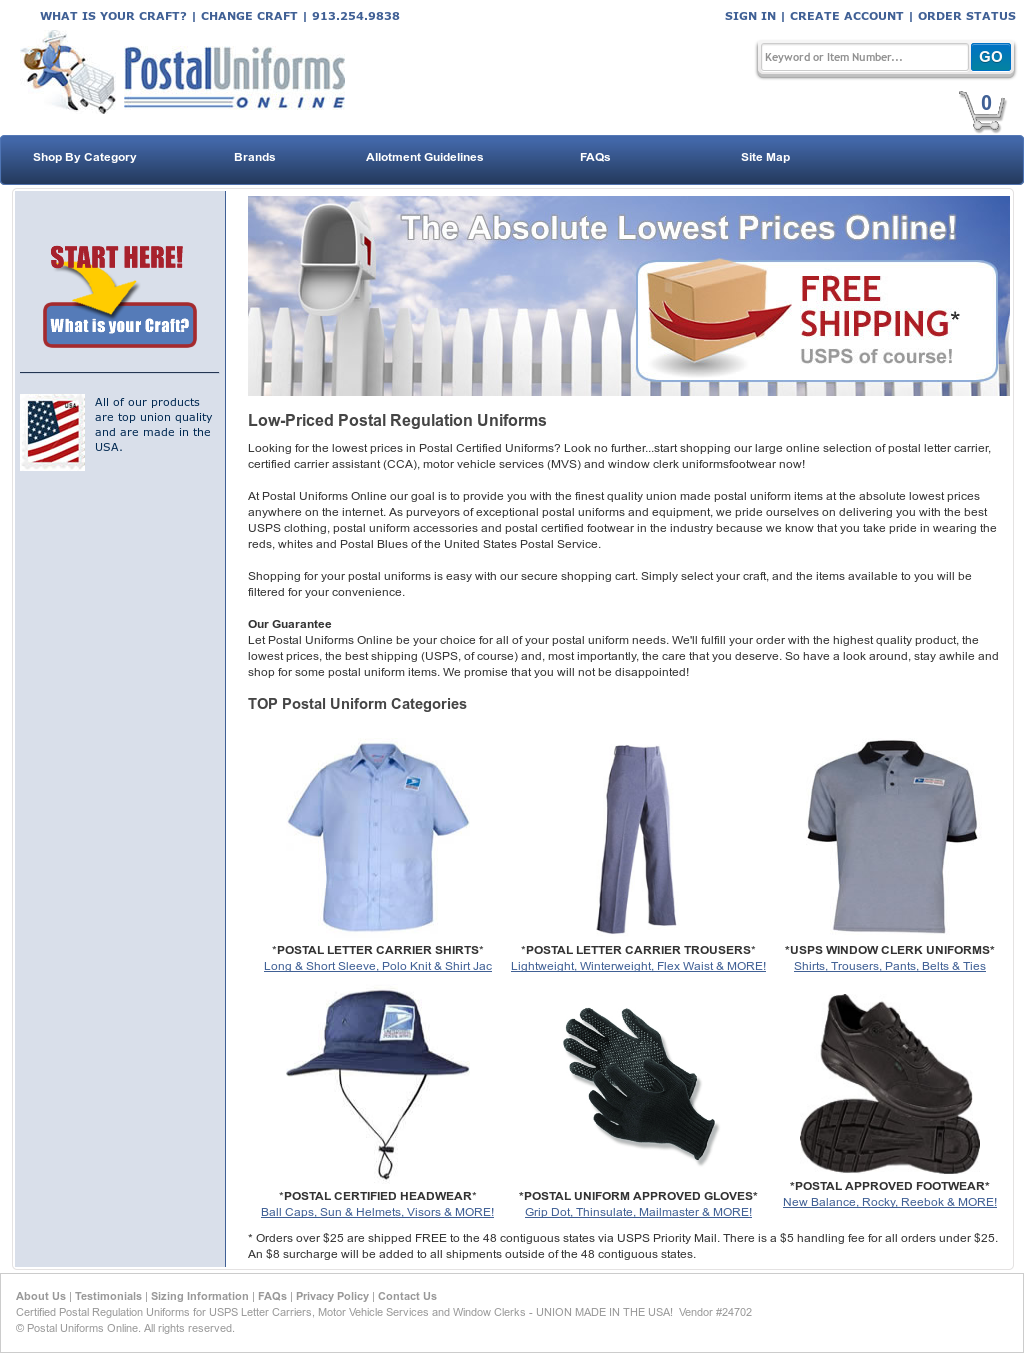 b870ab50cae Postal Uniforms Online Competitors